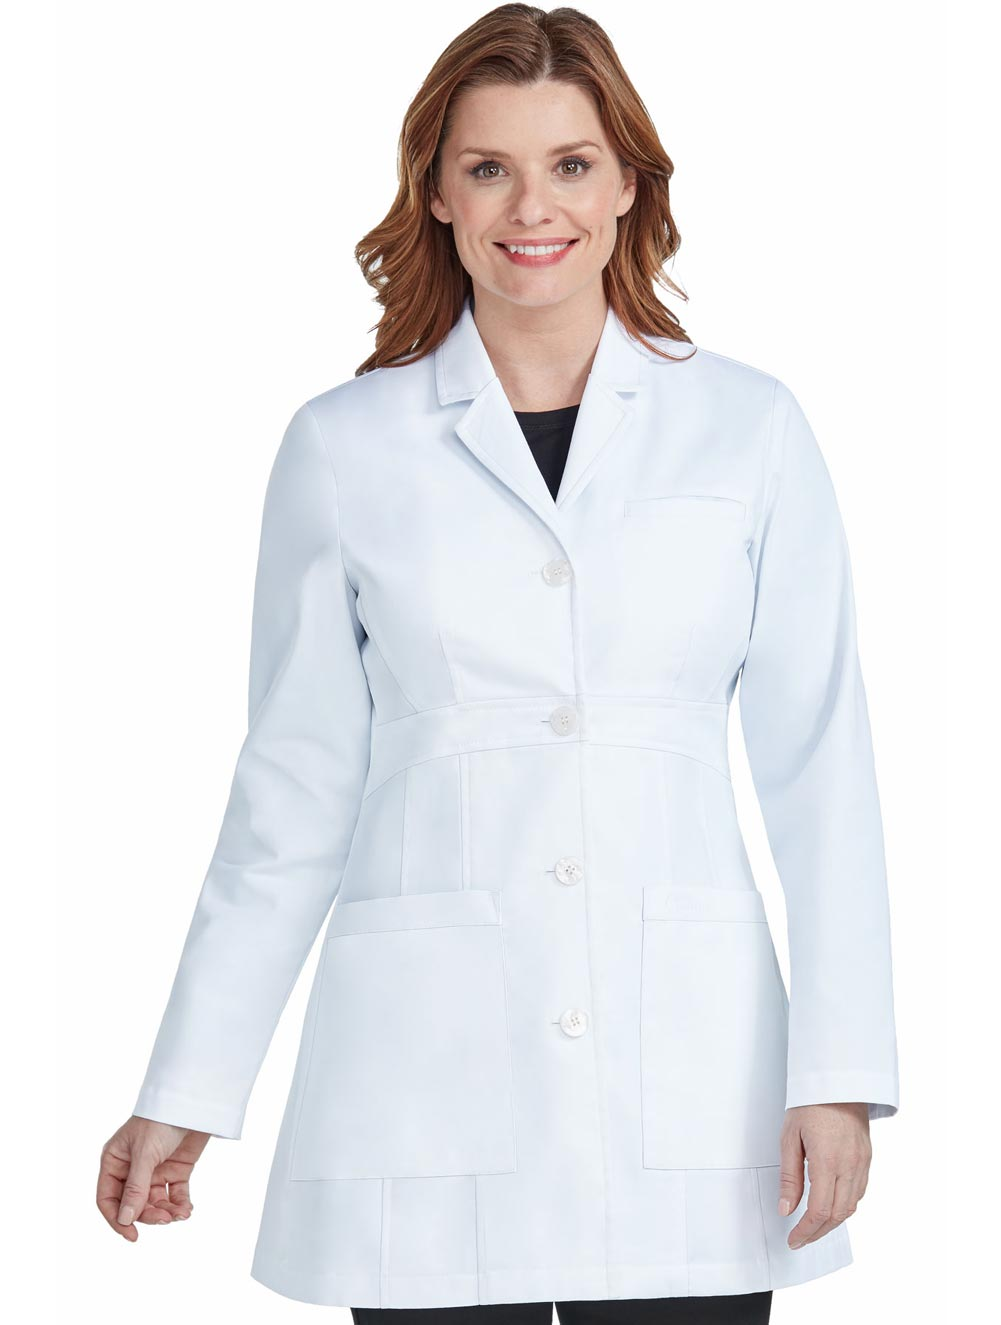 Women's 'Katherine' White Lab Coat